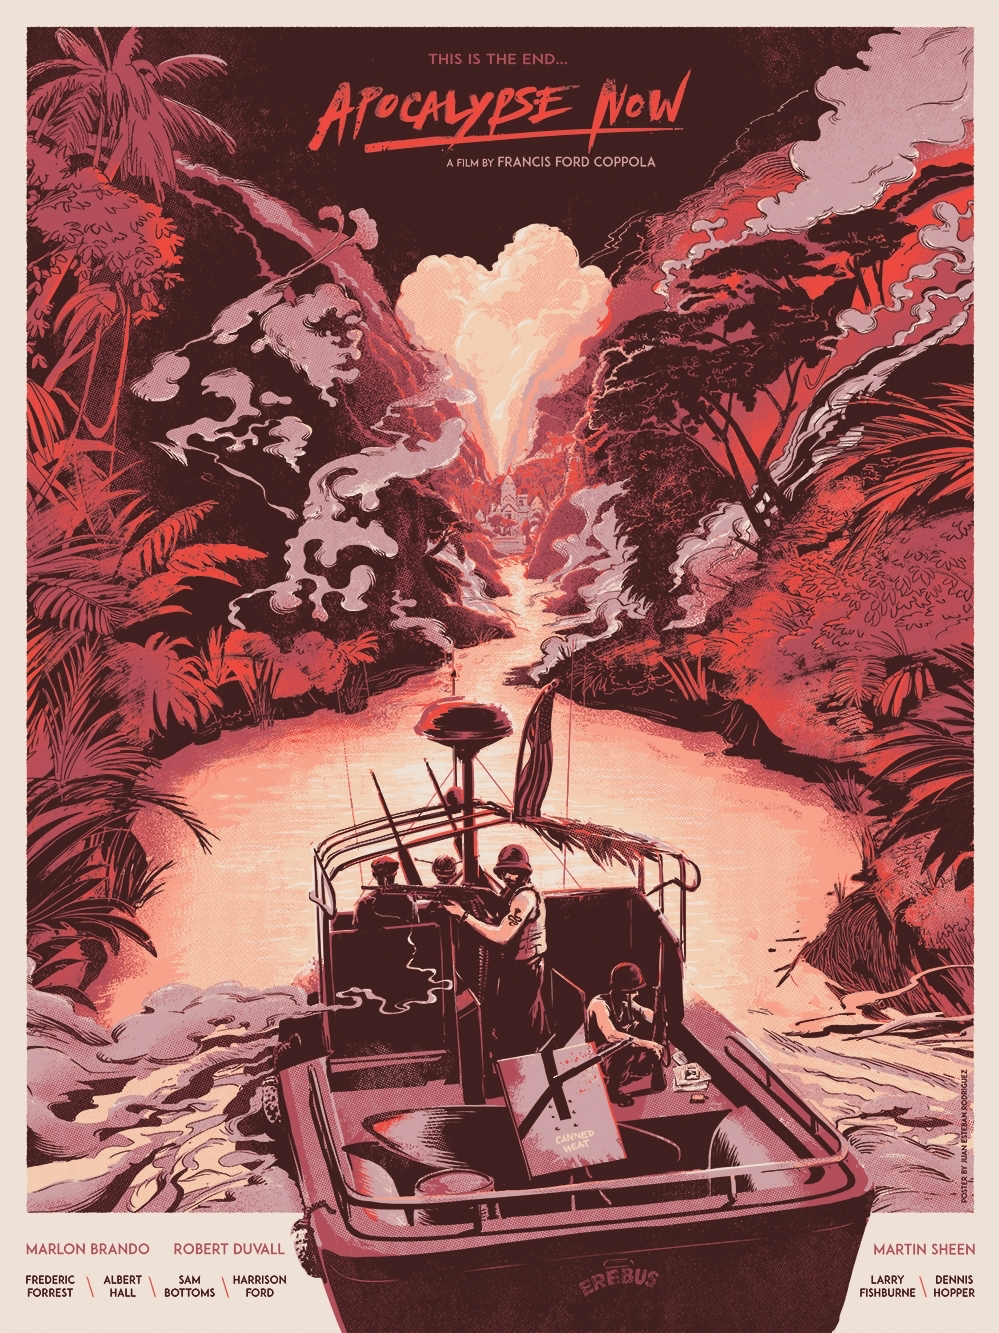 Juan Esteban Rodriguez, the Man behind the Amazing Movie Posters